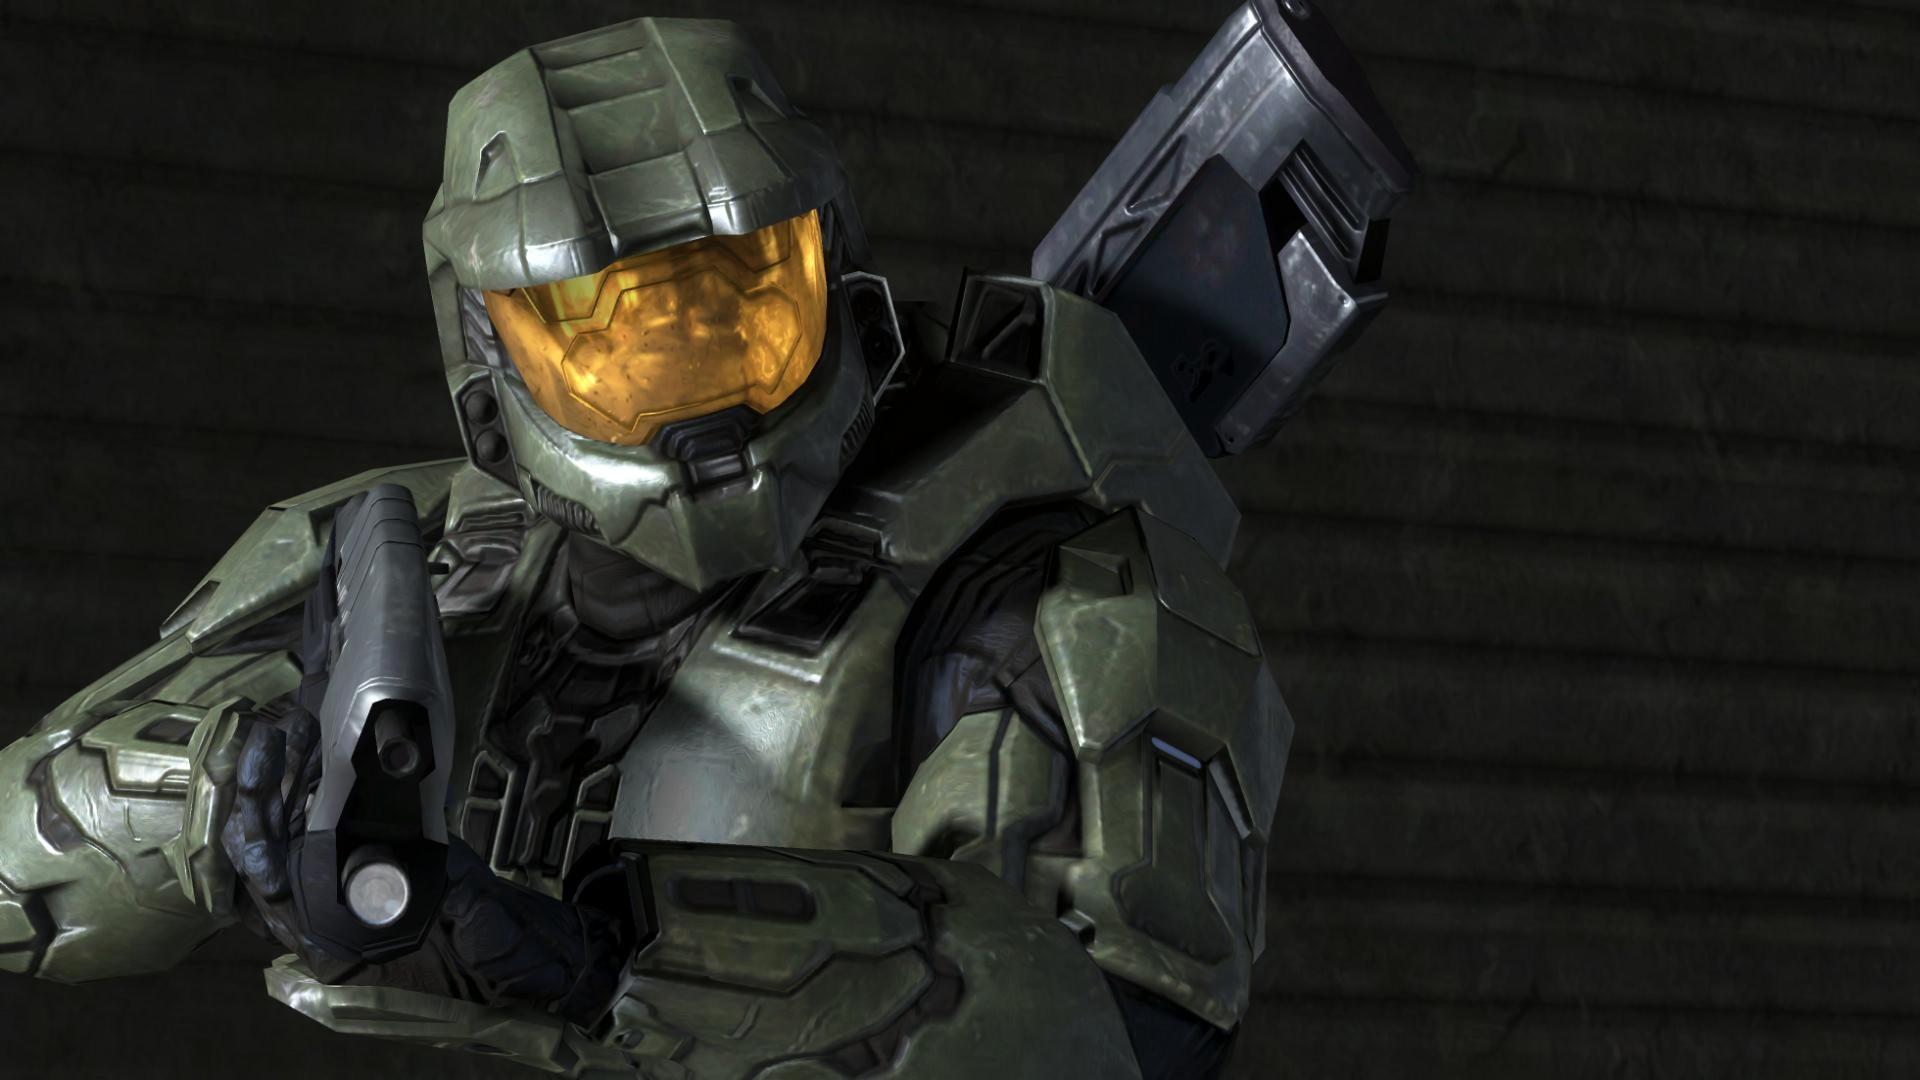 Halo 3 Crow's Nest (11) master chief wallpaper 1080p